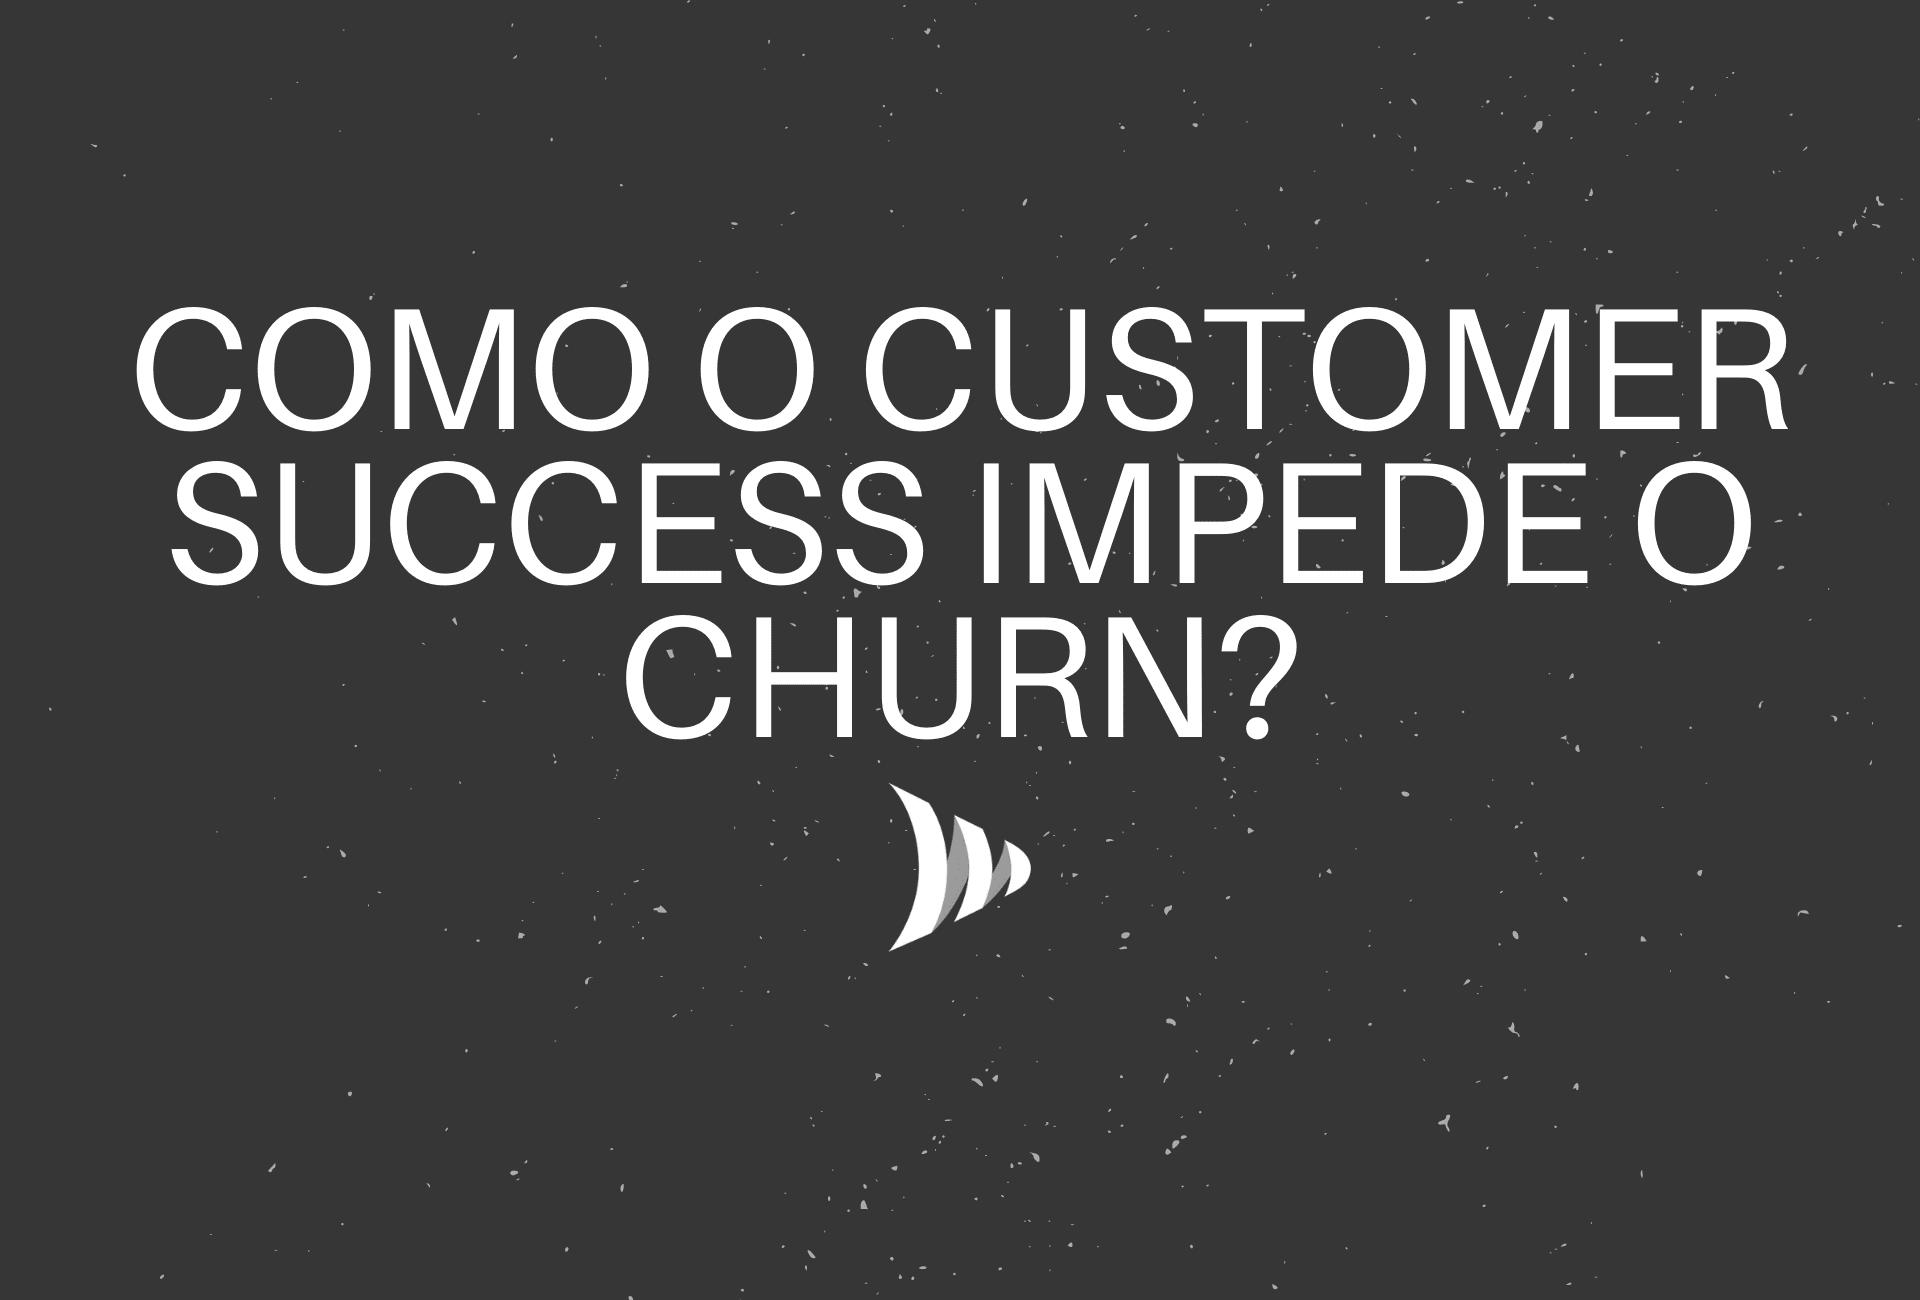 Como o Customer Success impede o Churn?